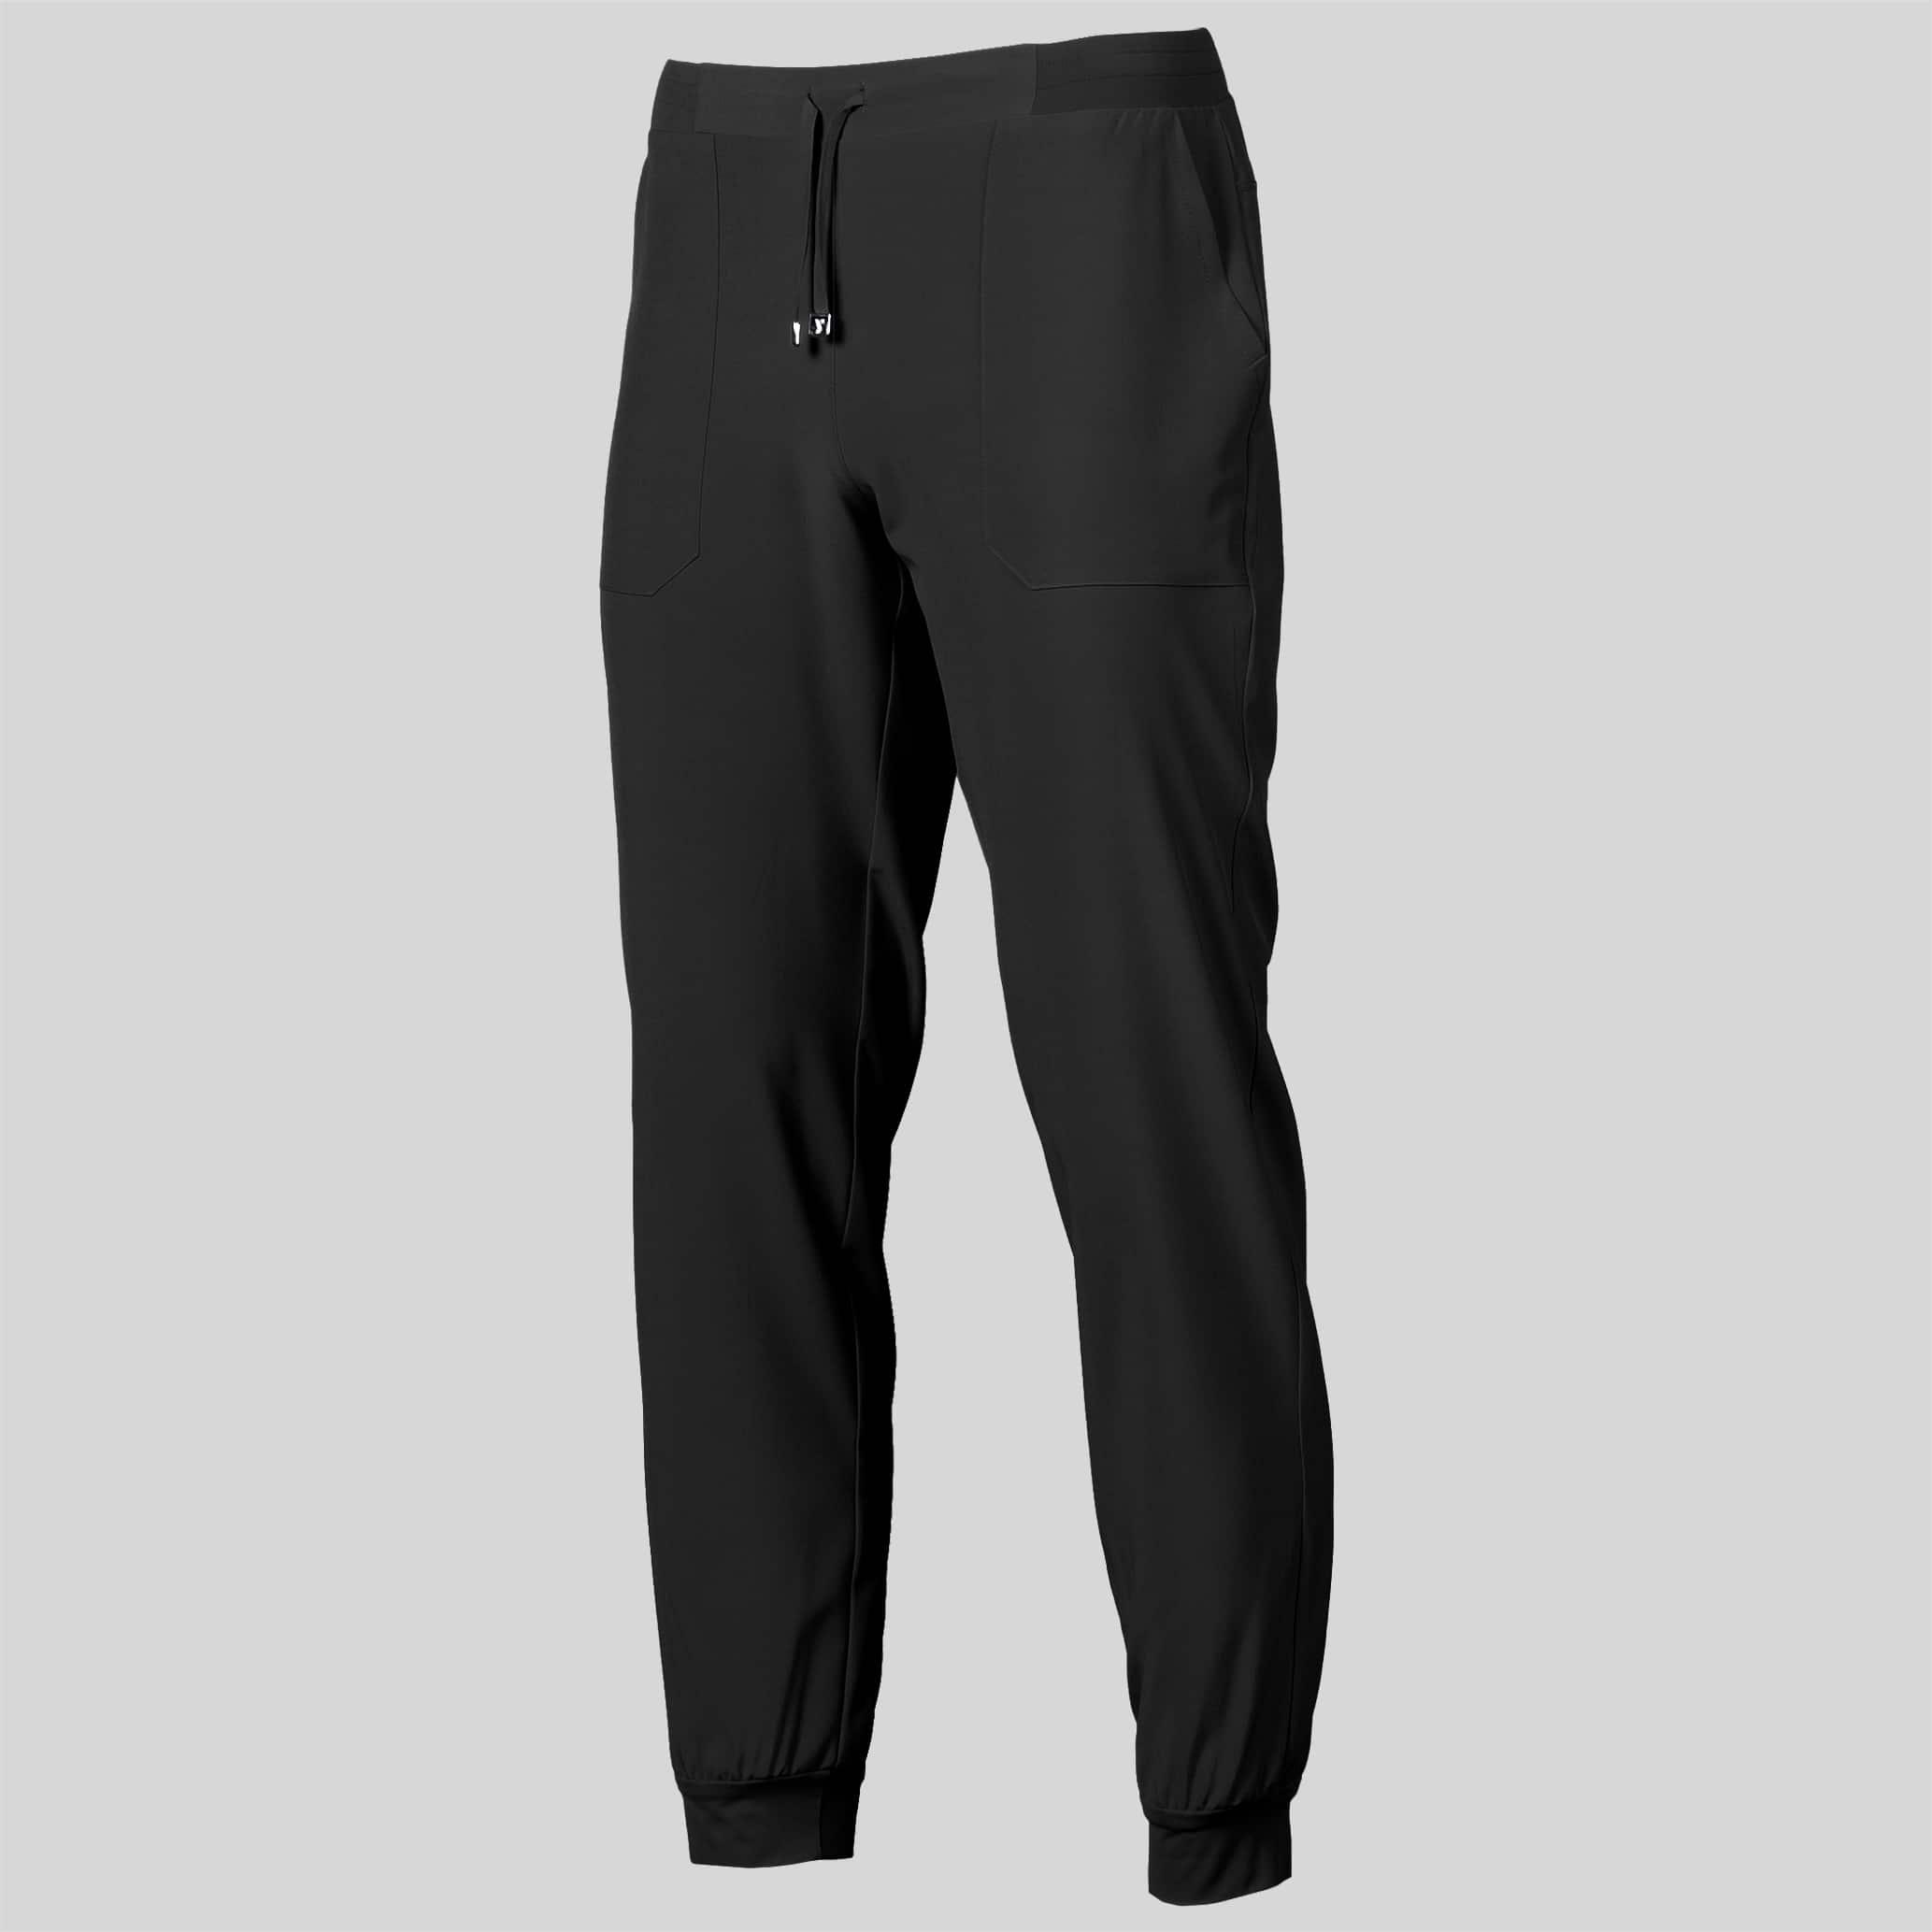 Gary´s 704700 Pantalon Unisex Jogger Negro